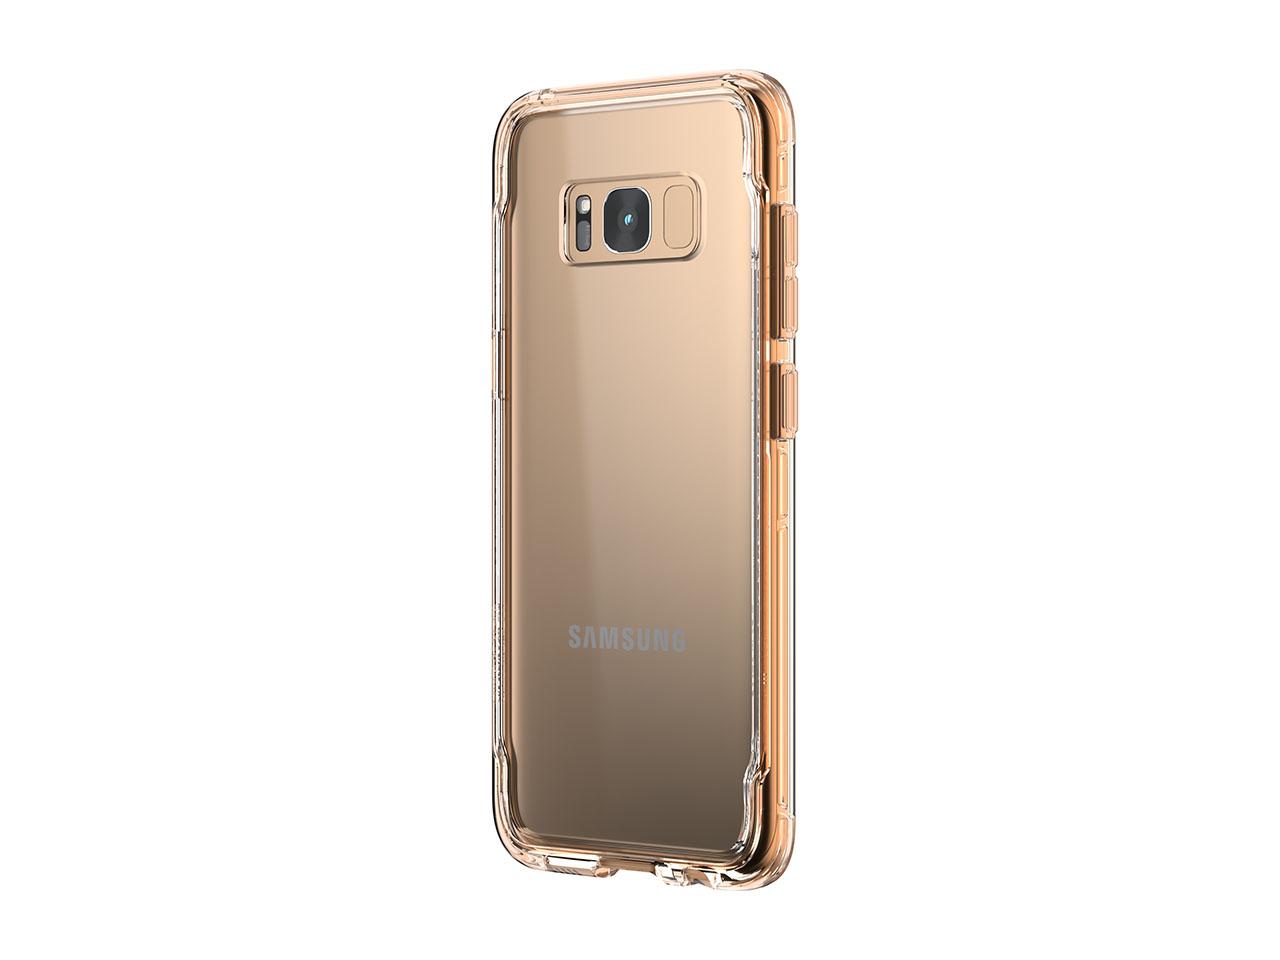 Samsung Galaxy S8 Protective See Through Case